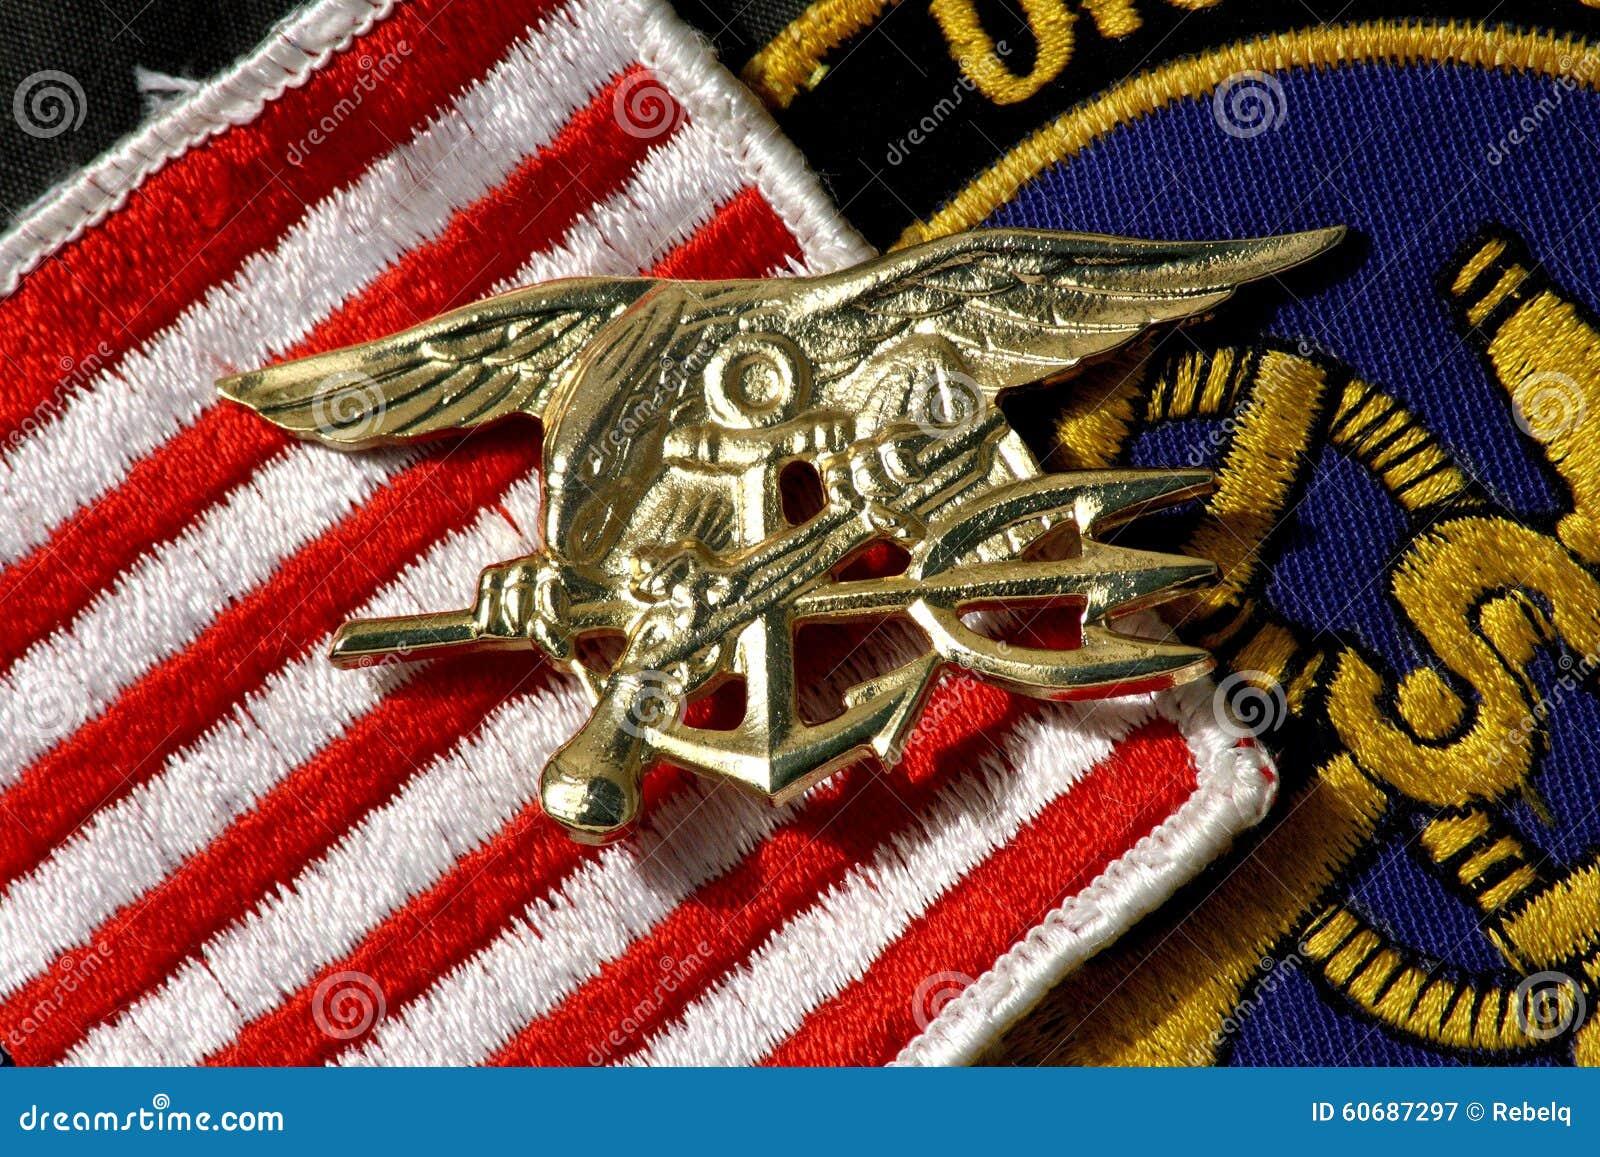 Navy SEALs Insignia TRIDENT Stock Photo - Image: 60687297